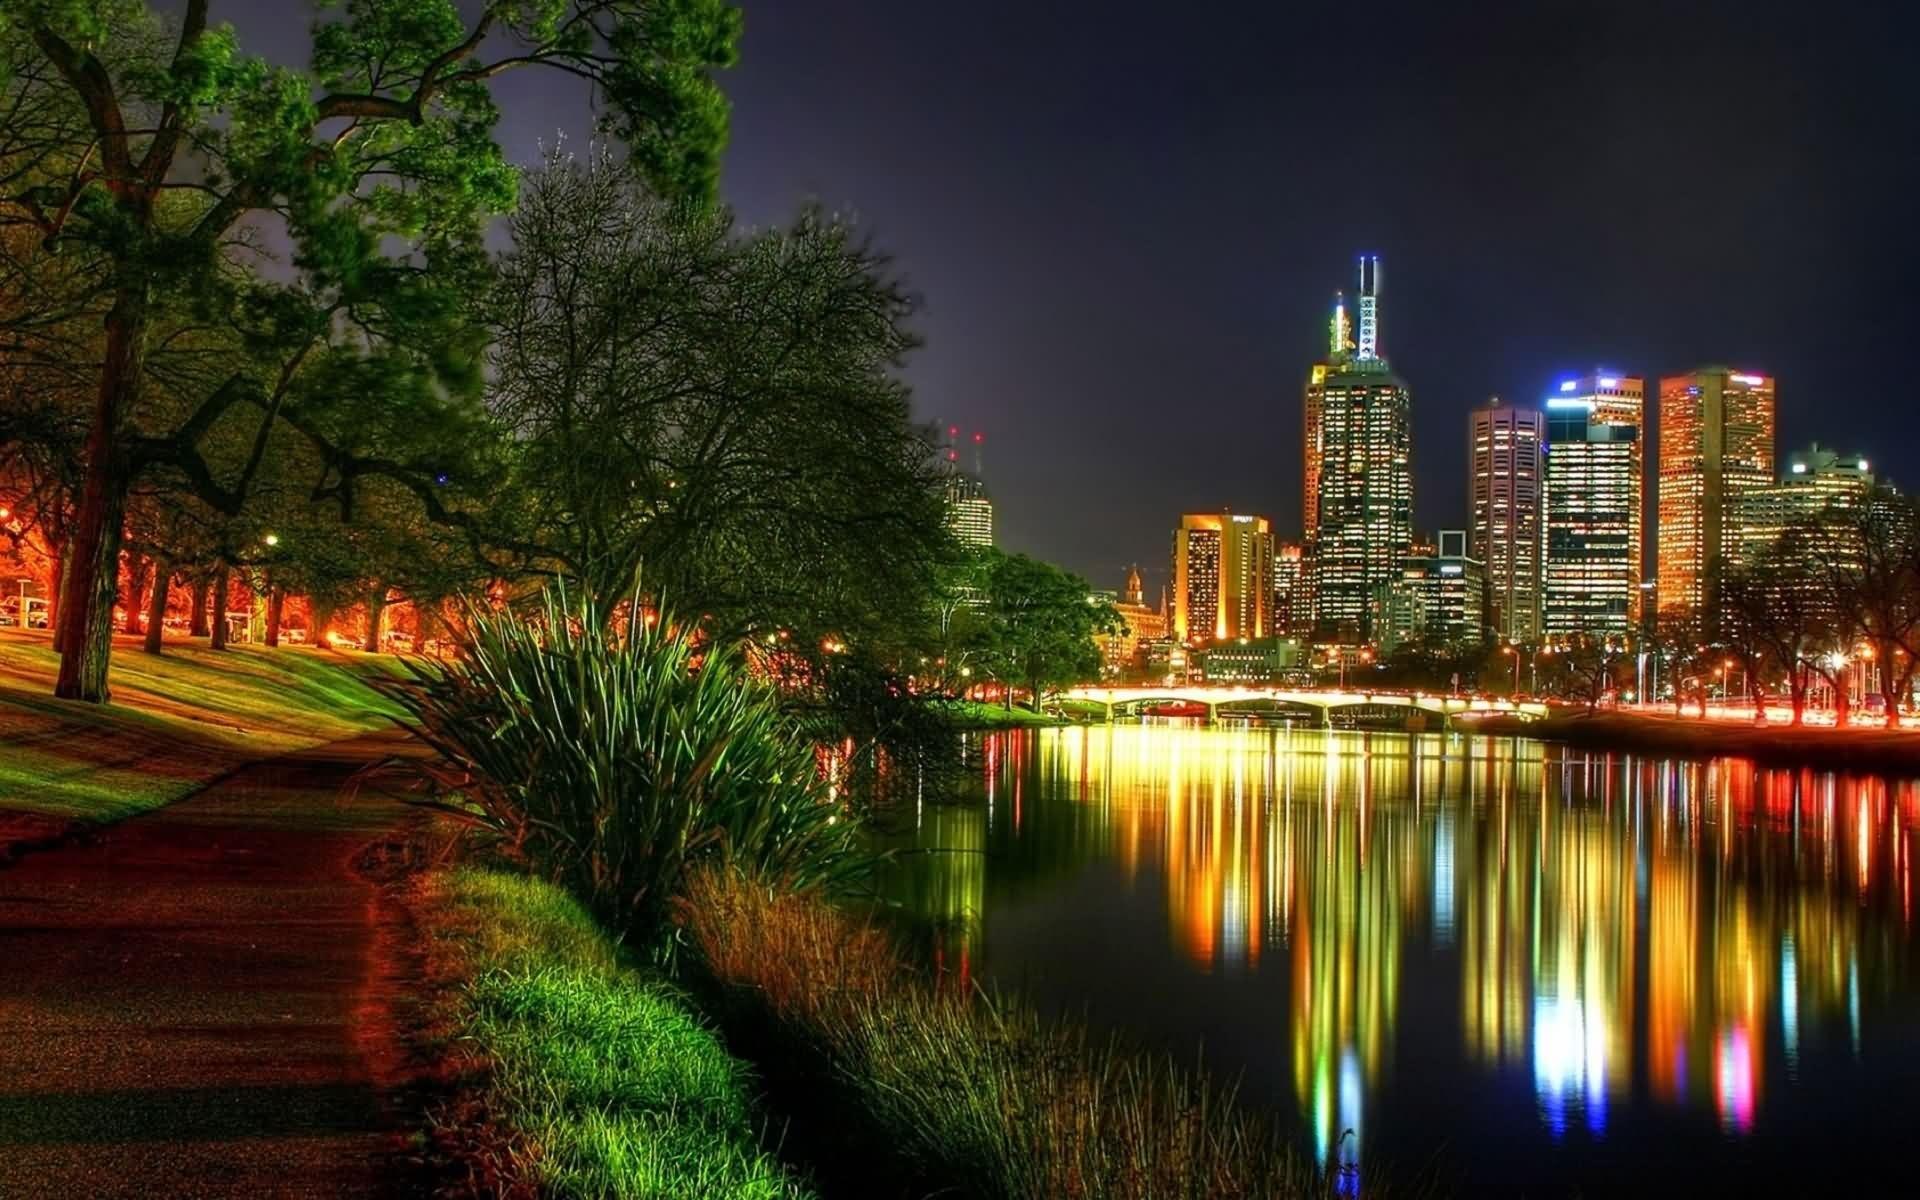 City at Night wallpaper Wallpapers   1920x1200   508816 1920x1200